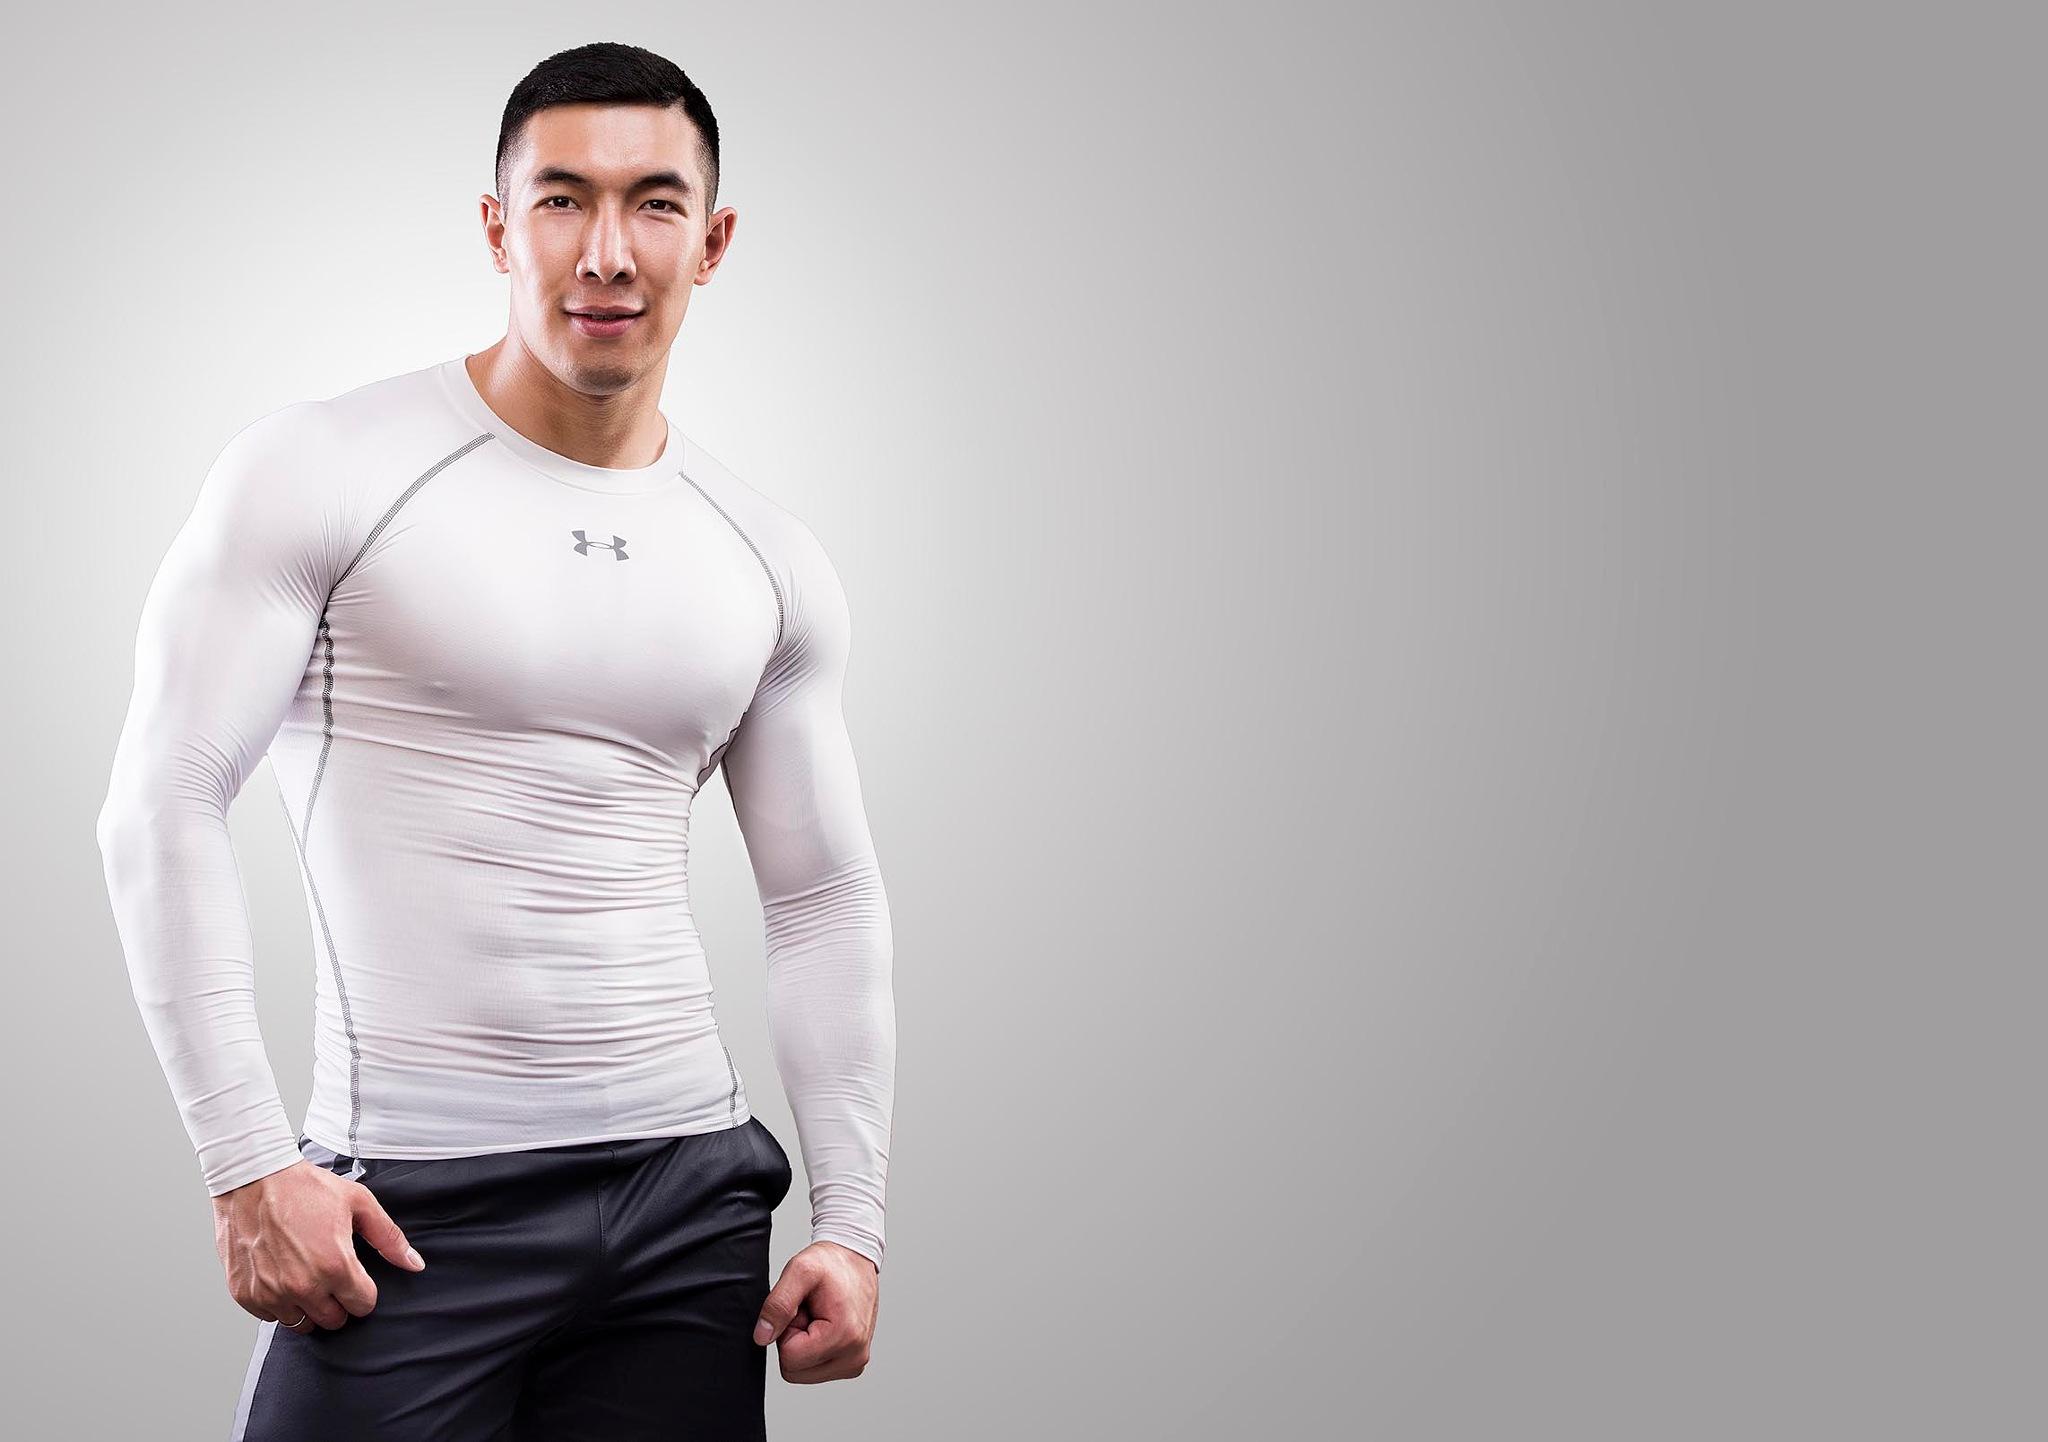 the kazakh bodybuilder by Marat Mukanov